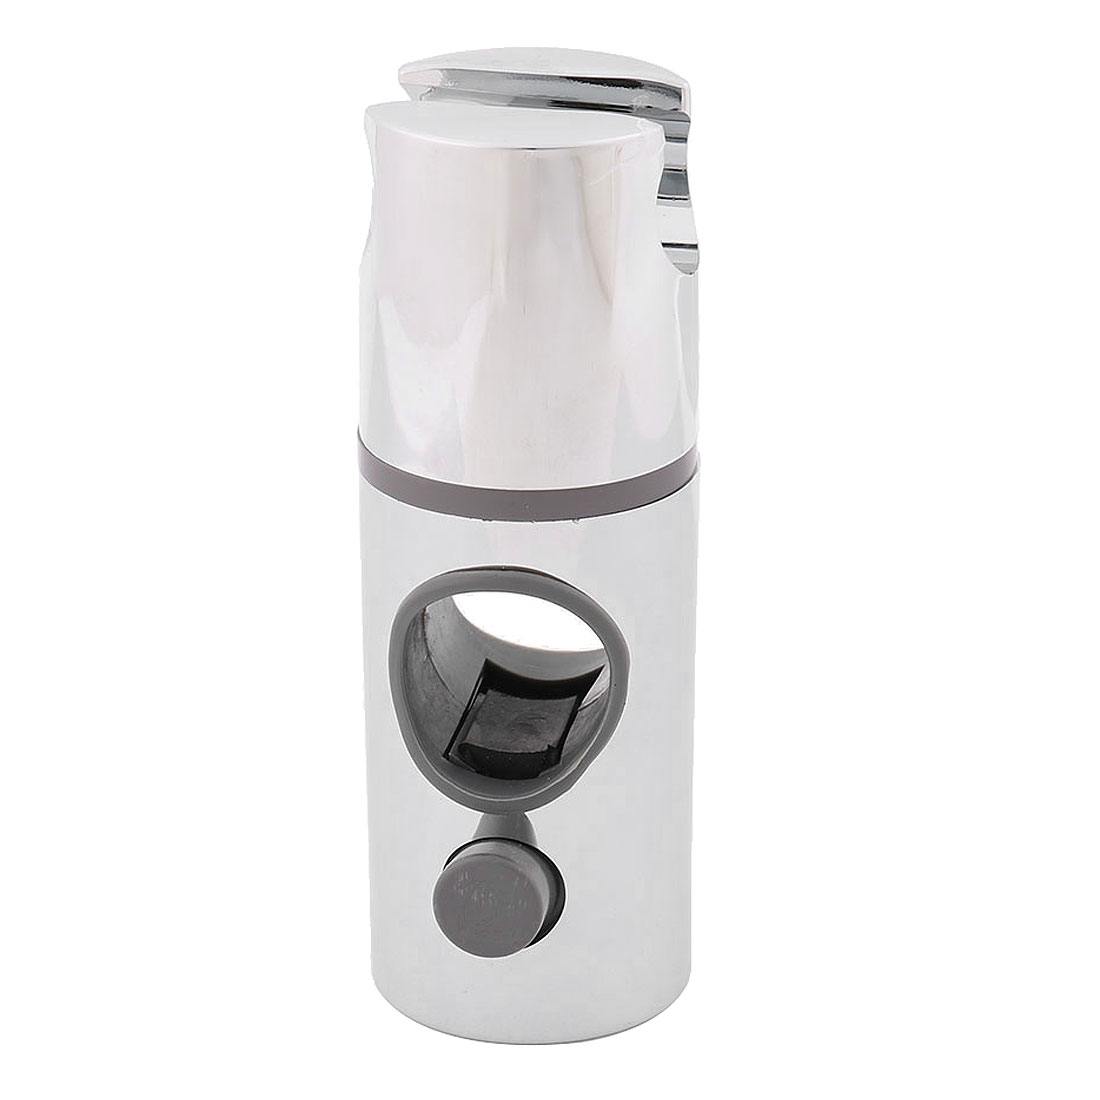 Home Bathroom Wall Sprinkler Handle Fixed Support Hand Held Shower Head Holder